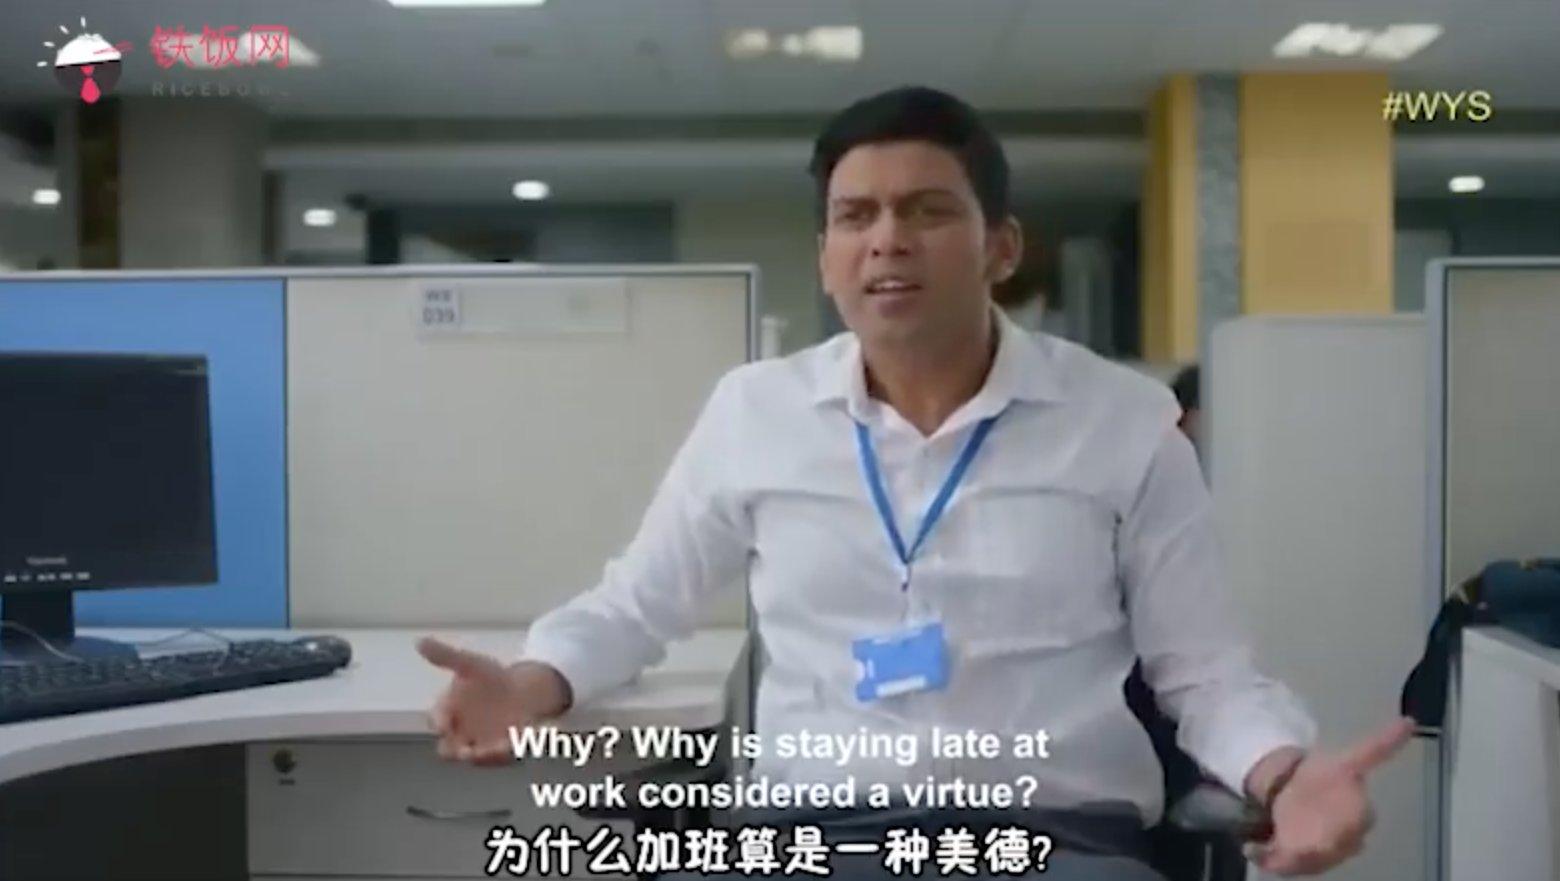 4 7.png?resize=412,232 - 還在辦公室加班ing?快拿這段影片去打臉老闆...拿回對人生的主控權阿!